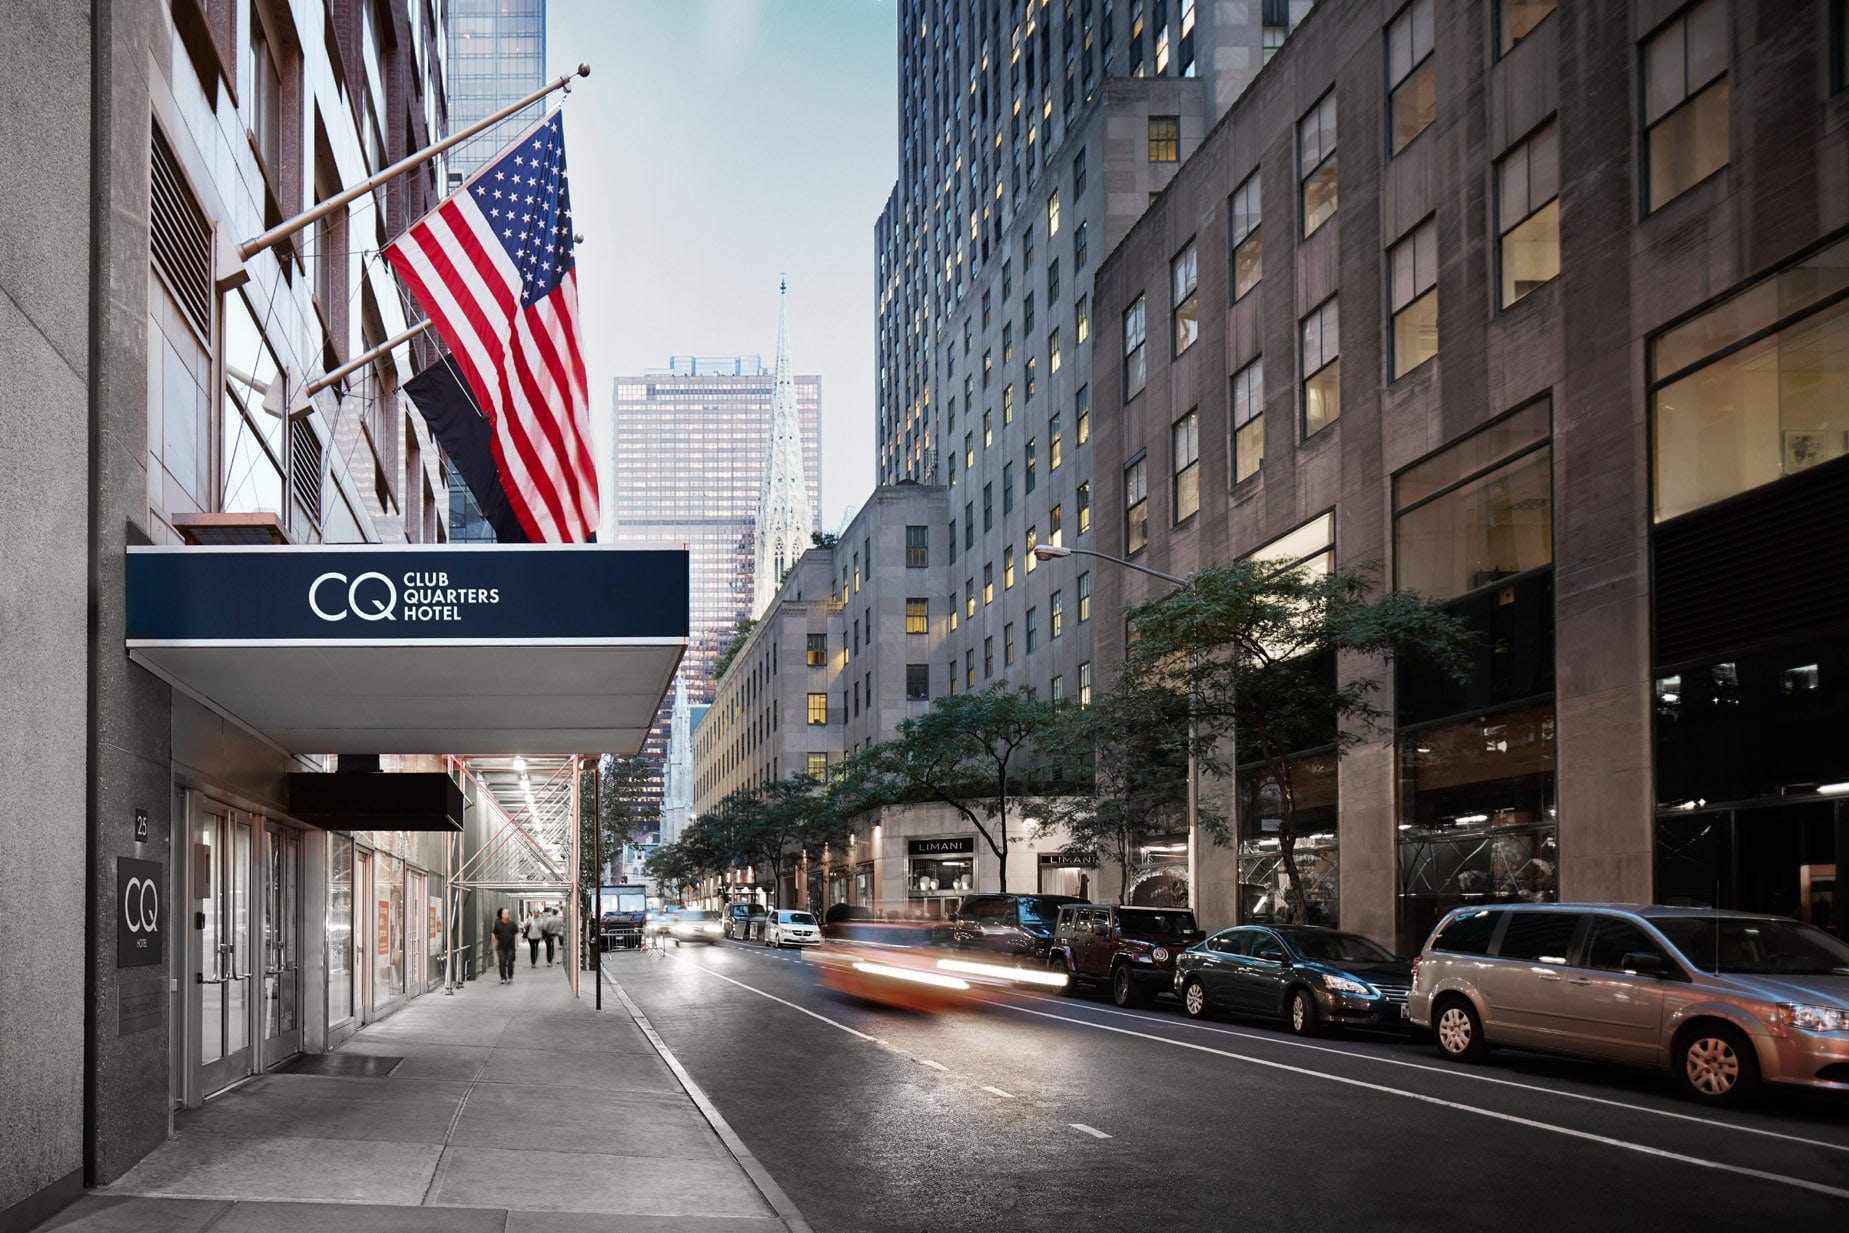 Exterior Of Club Quarters Hotel, Opp Rockefeller Center New York City